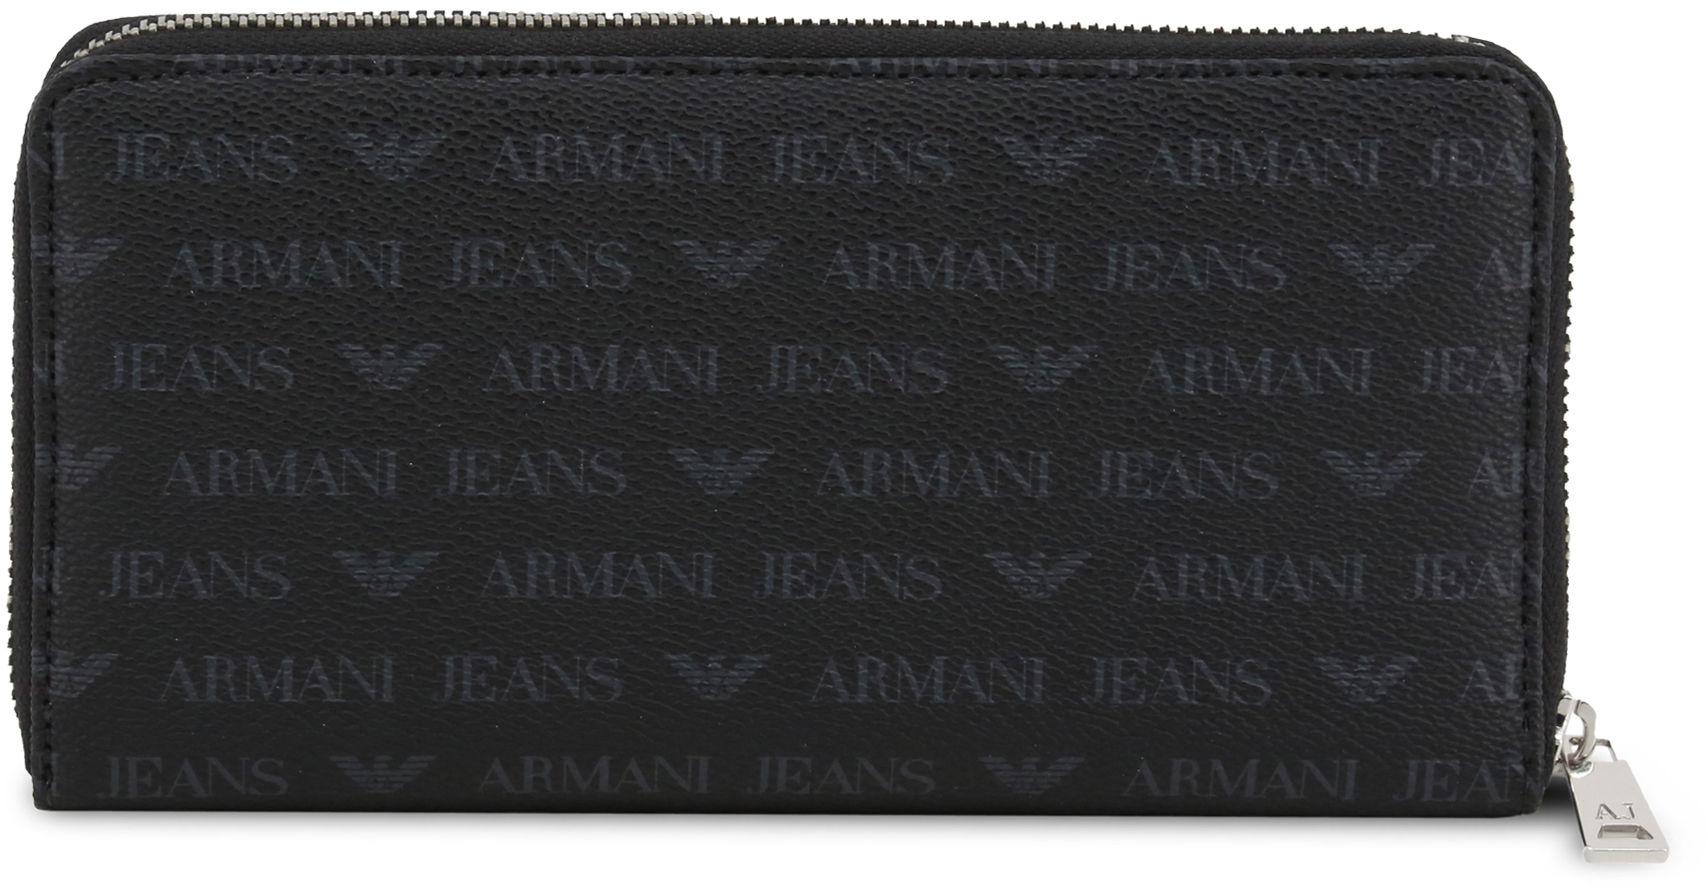 Portfele Armani Jeans Unisex